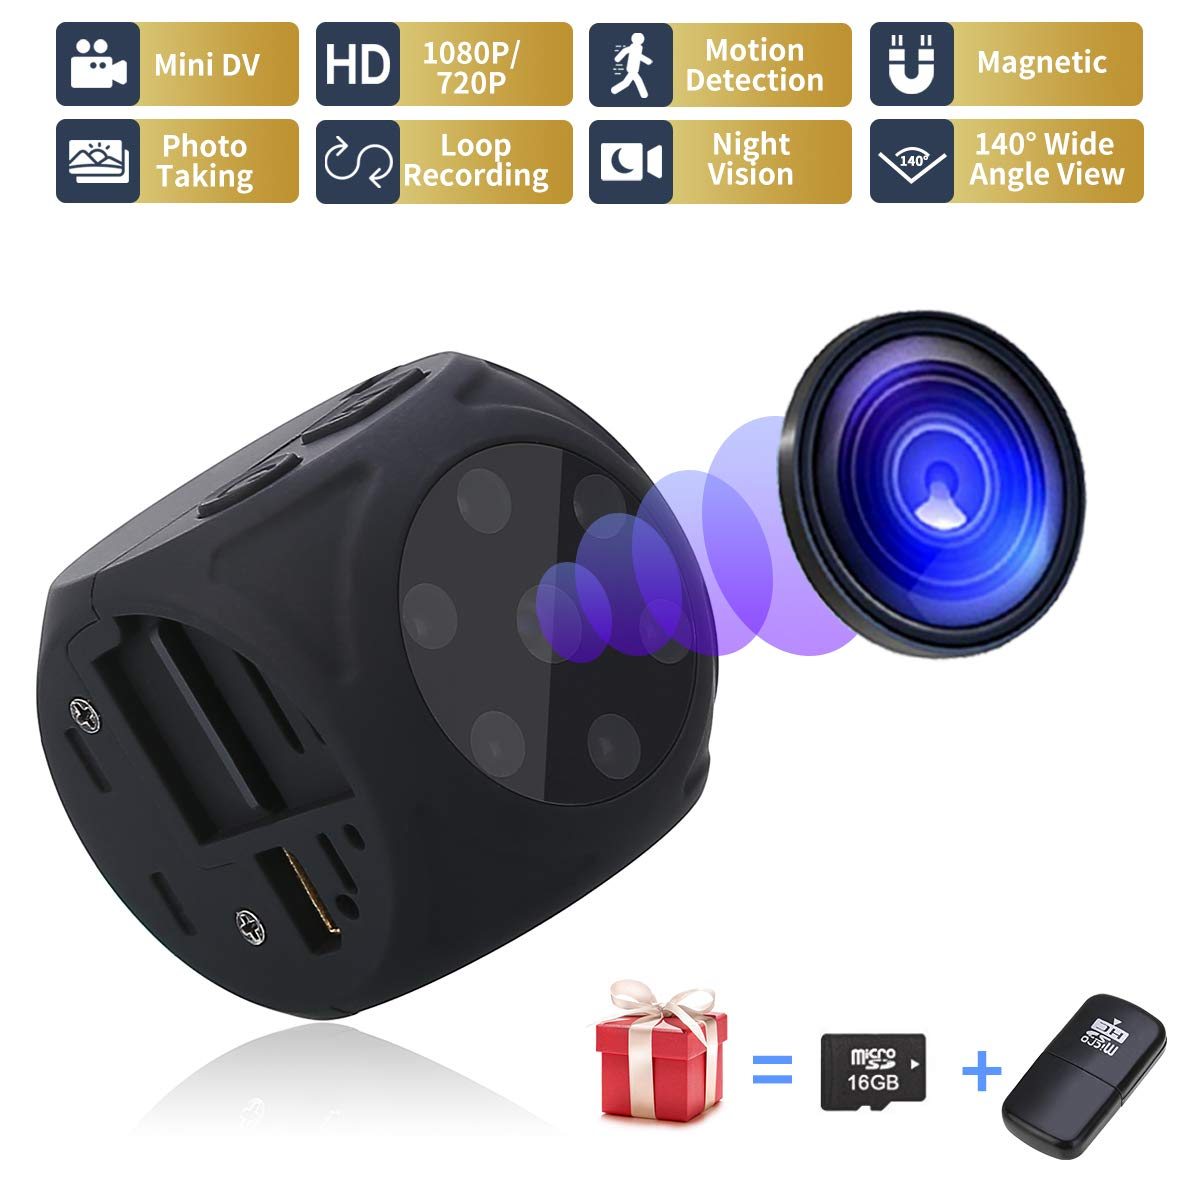 USB Hidden Camera - Spy Camera Wireless Hidden - Mini Camera(No WiFi) - 1080P Portable Small Camera with Night Vision and Motion Detective, Security Camera Surveillance Camera Nanny Cam for Car HOM